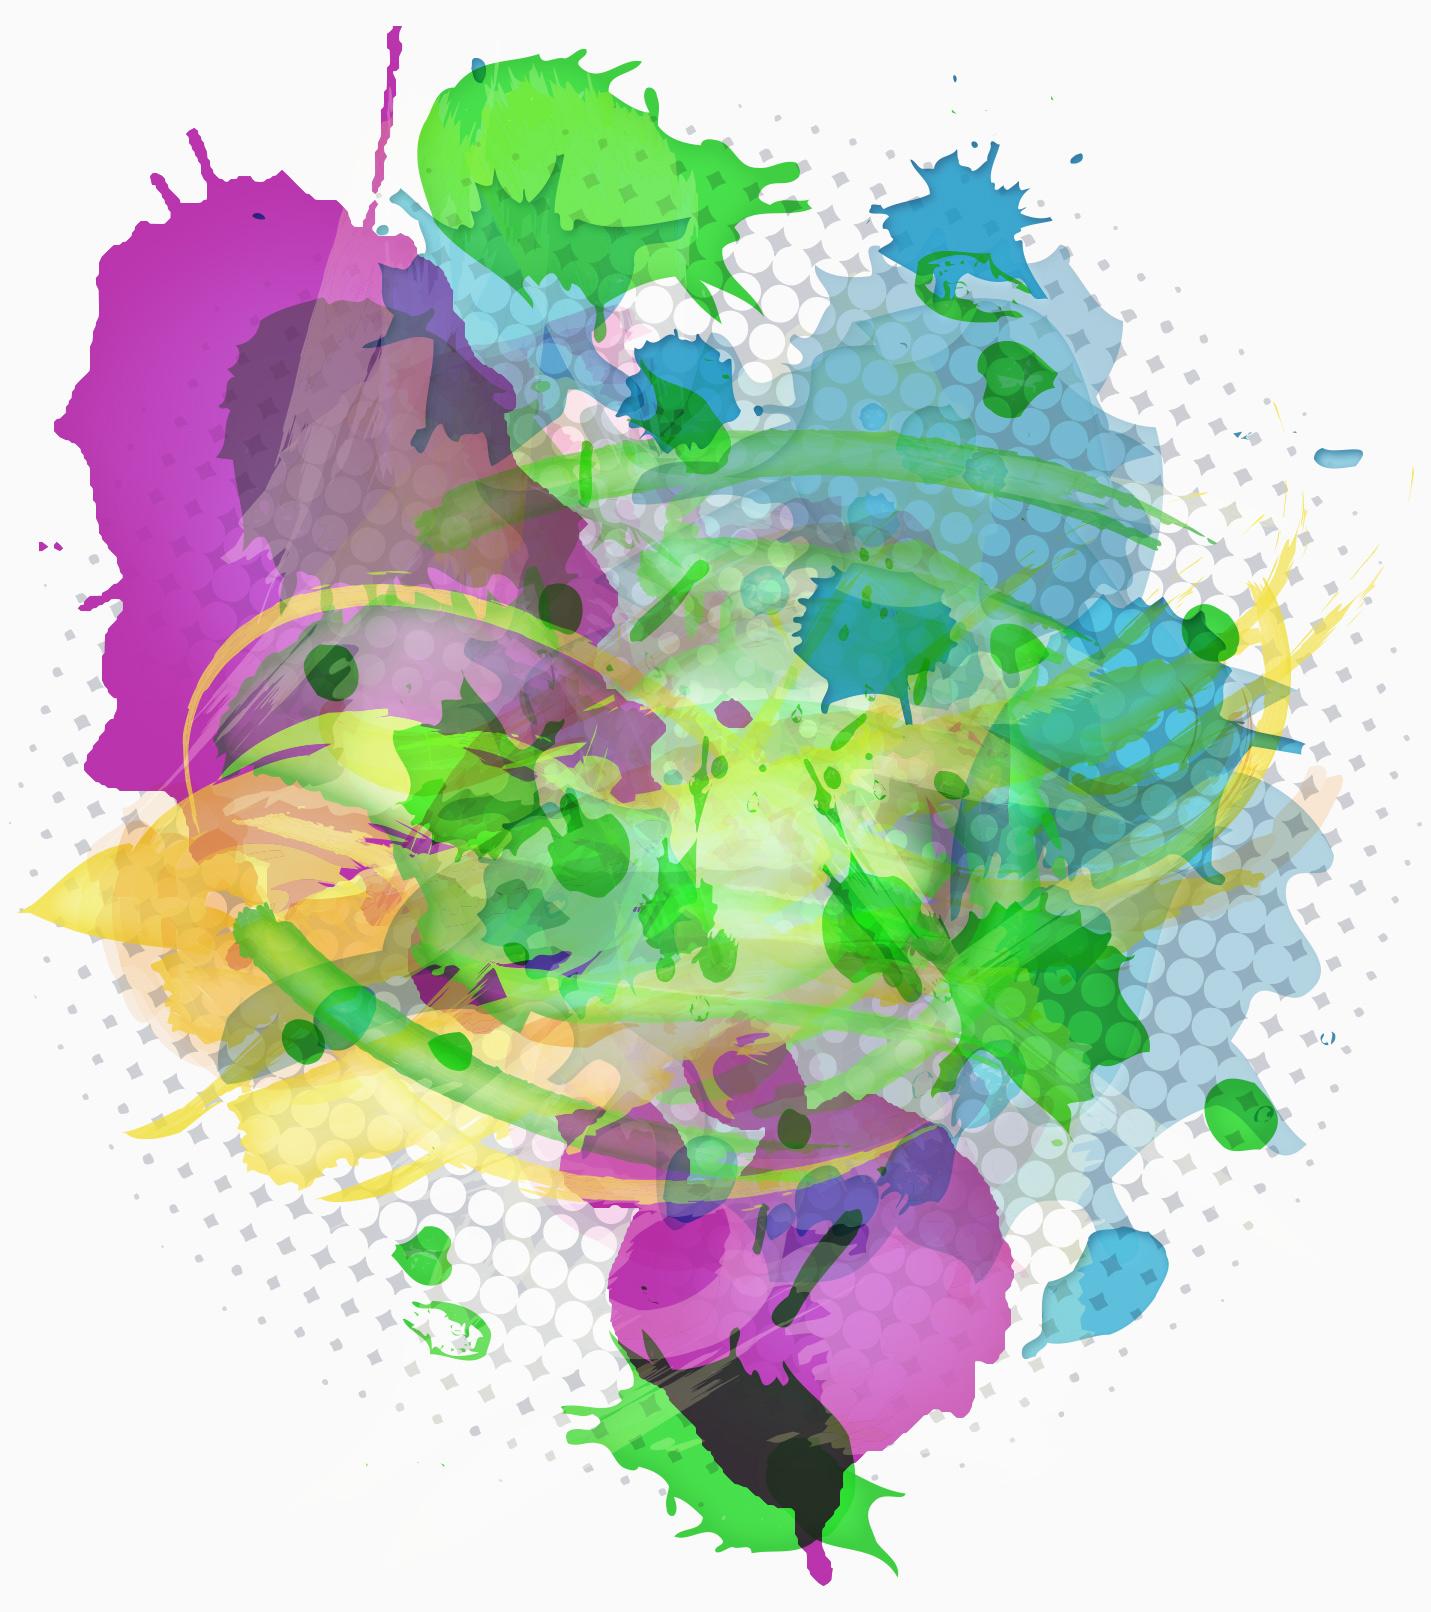 artists designers image